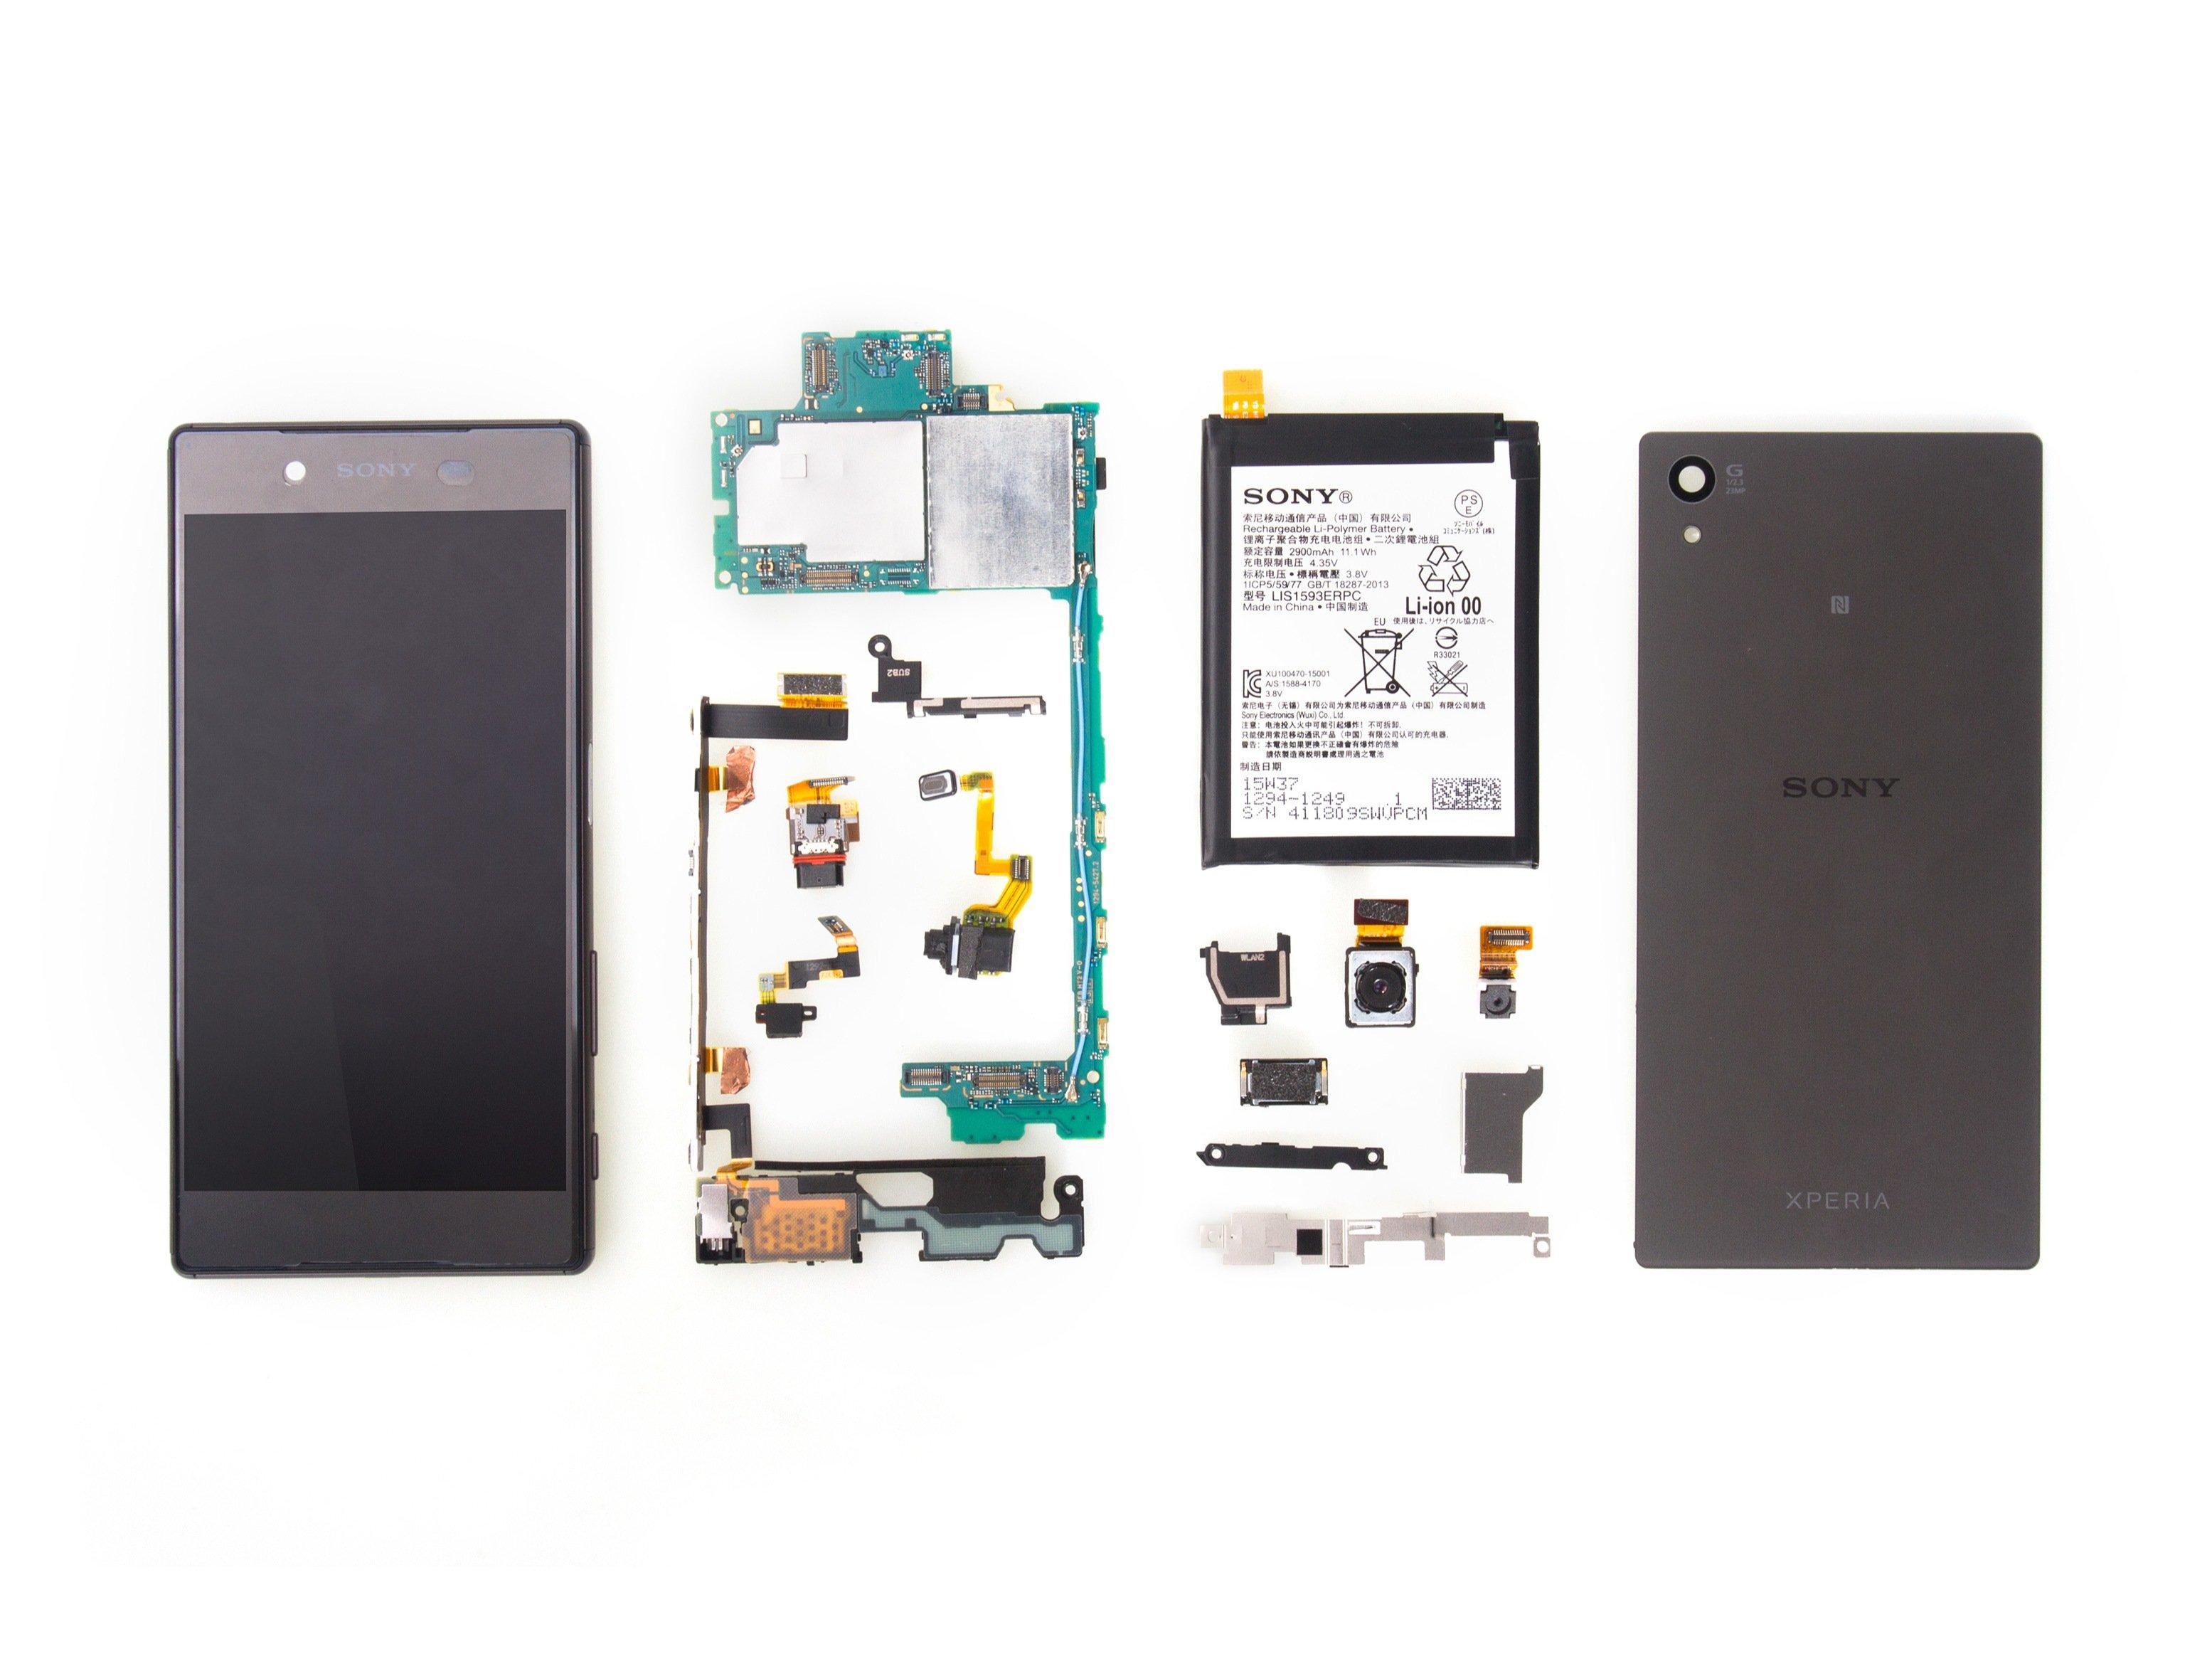 xperia z circuit diagram wiring diagrams dock Sony Xperia E15i